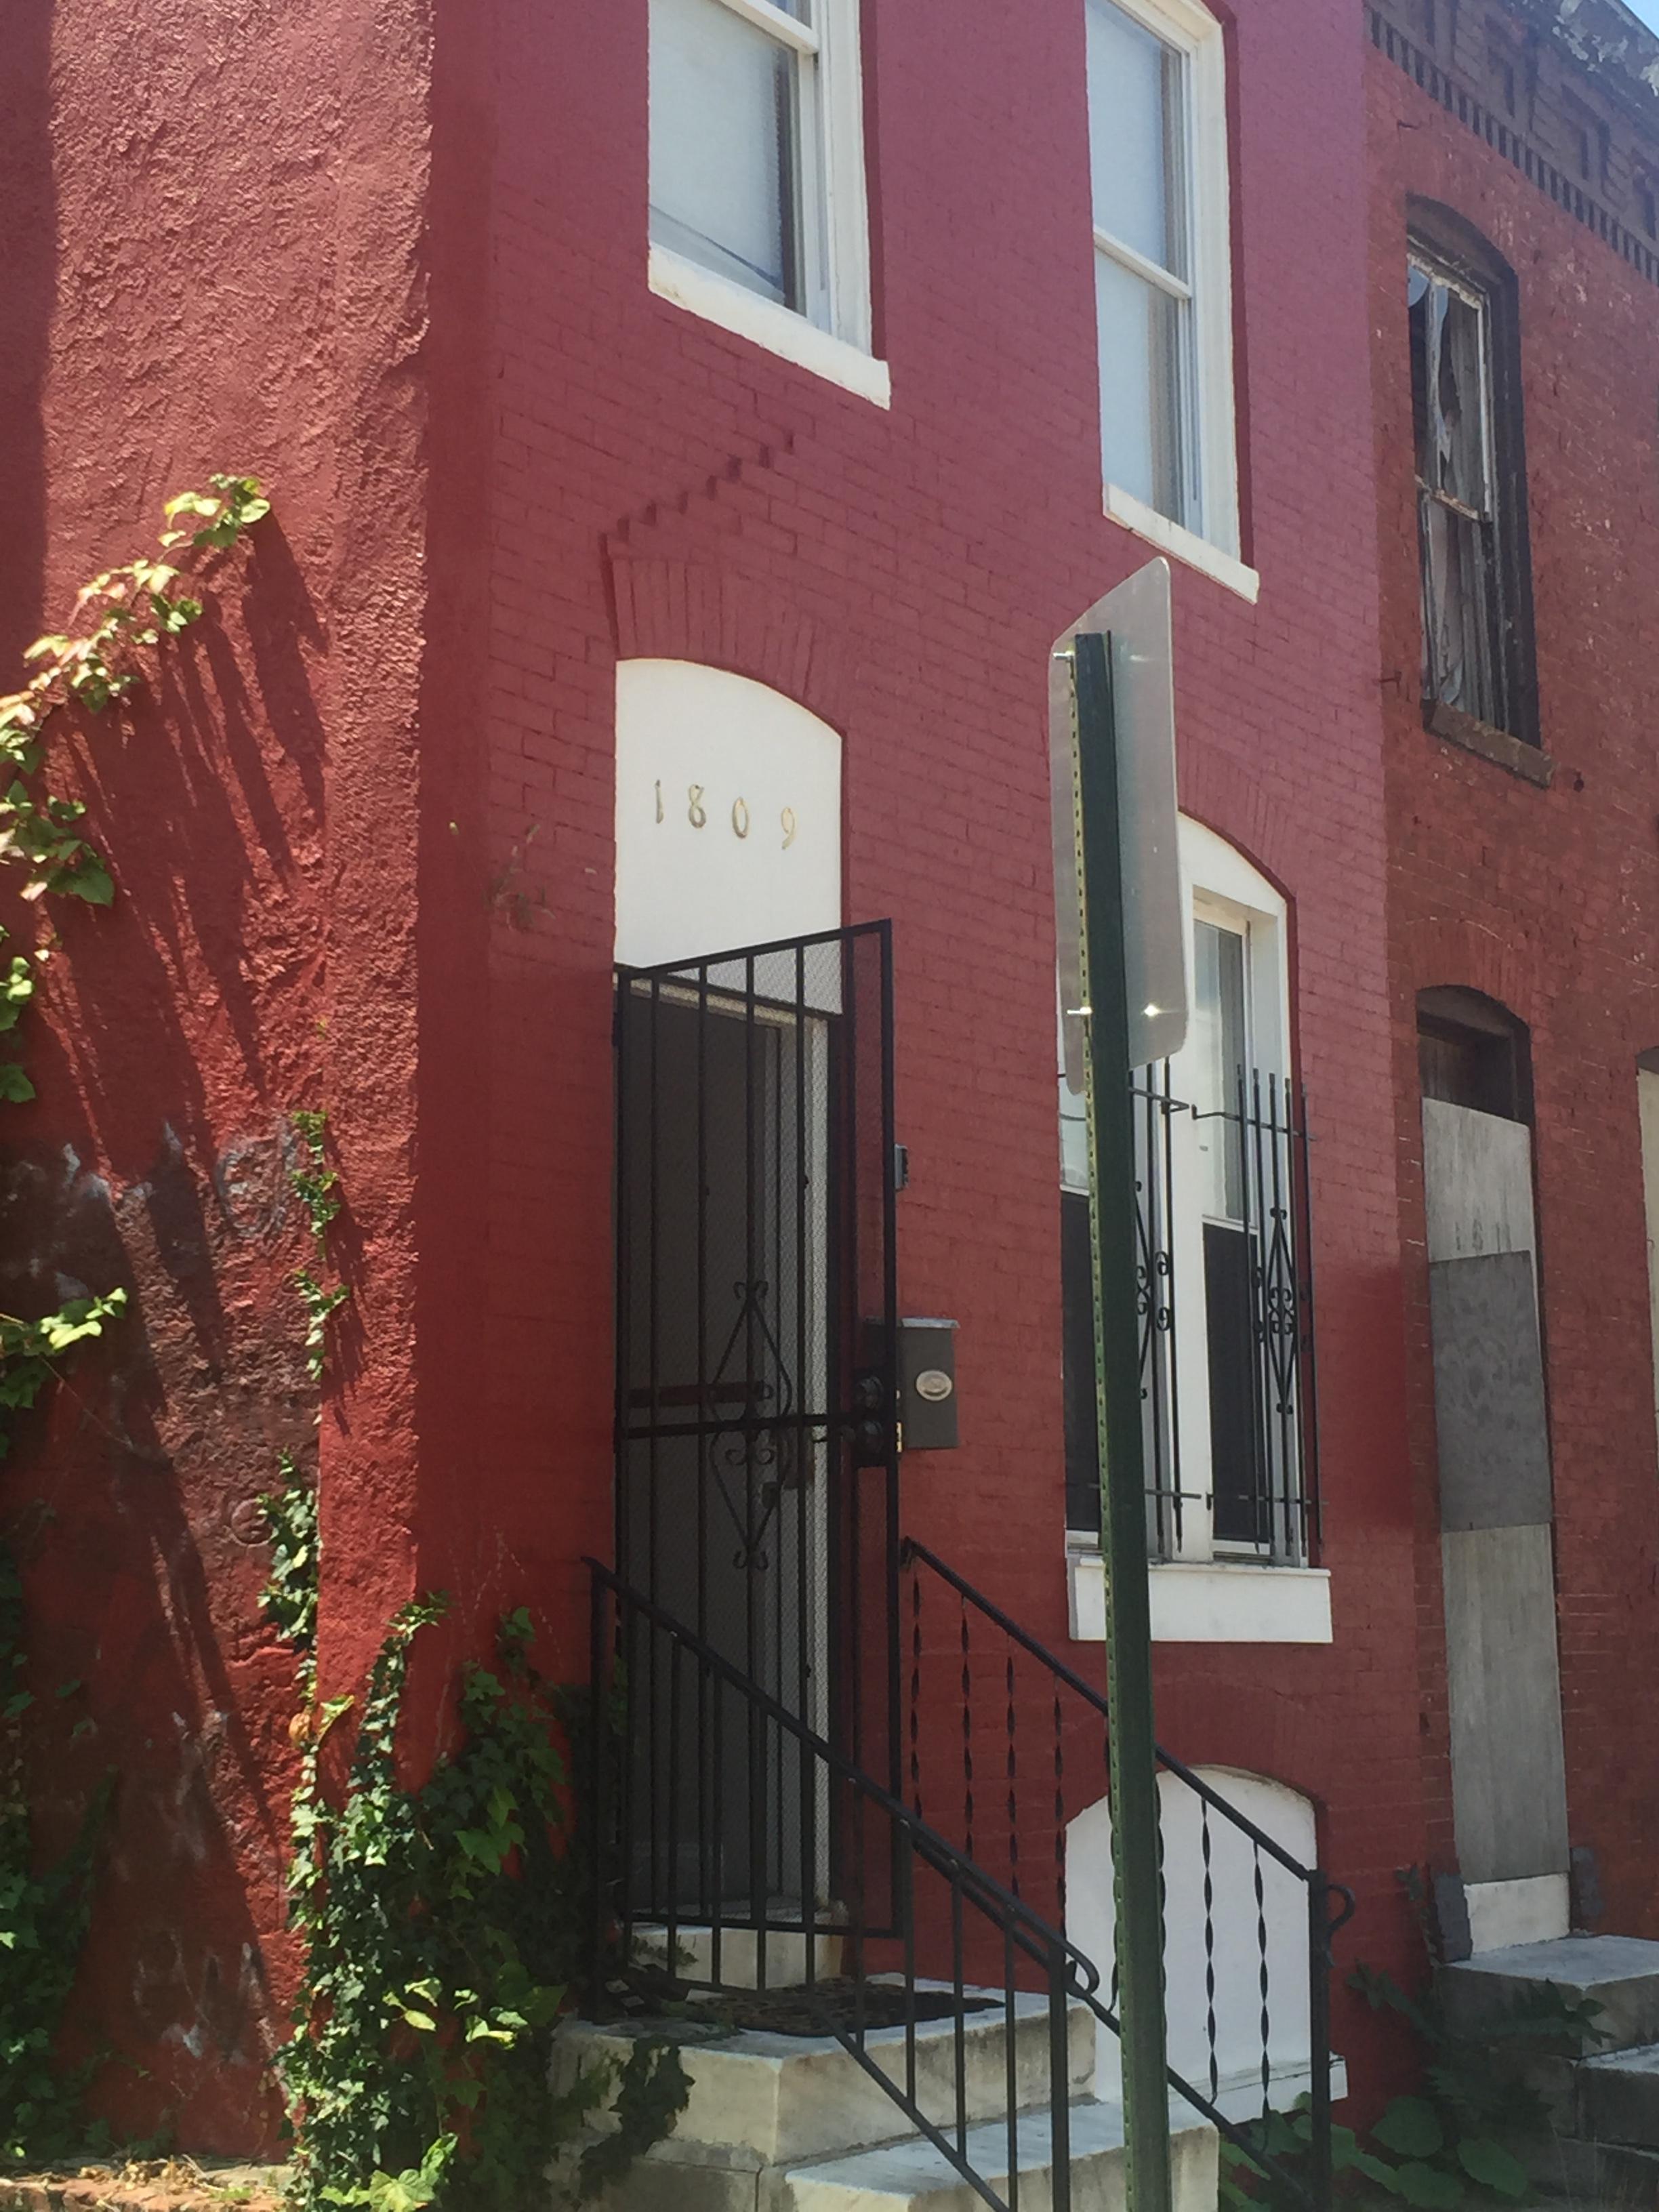 1809 Rayner Ave (Image - 1)